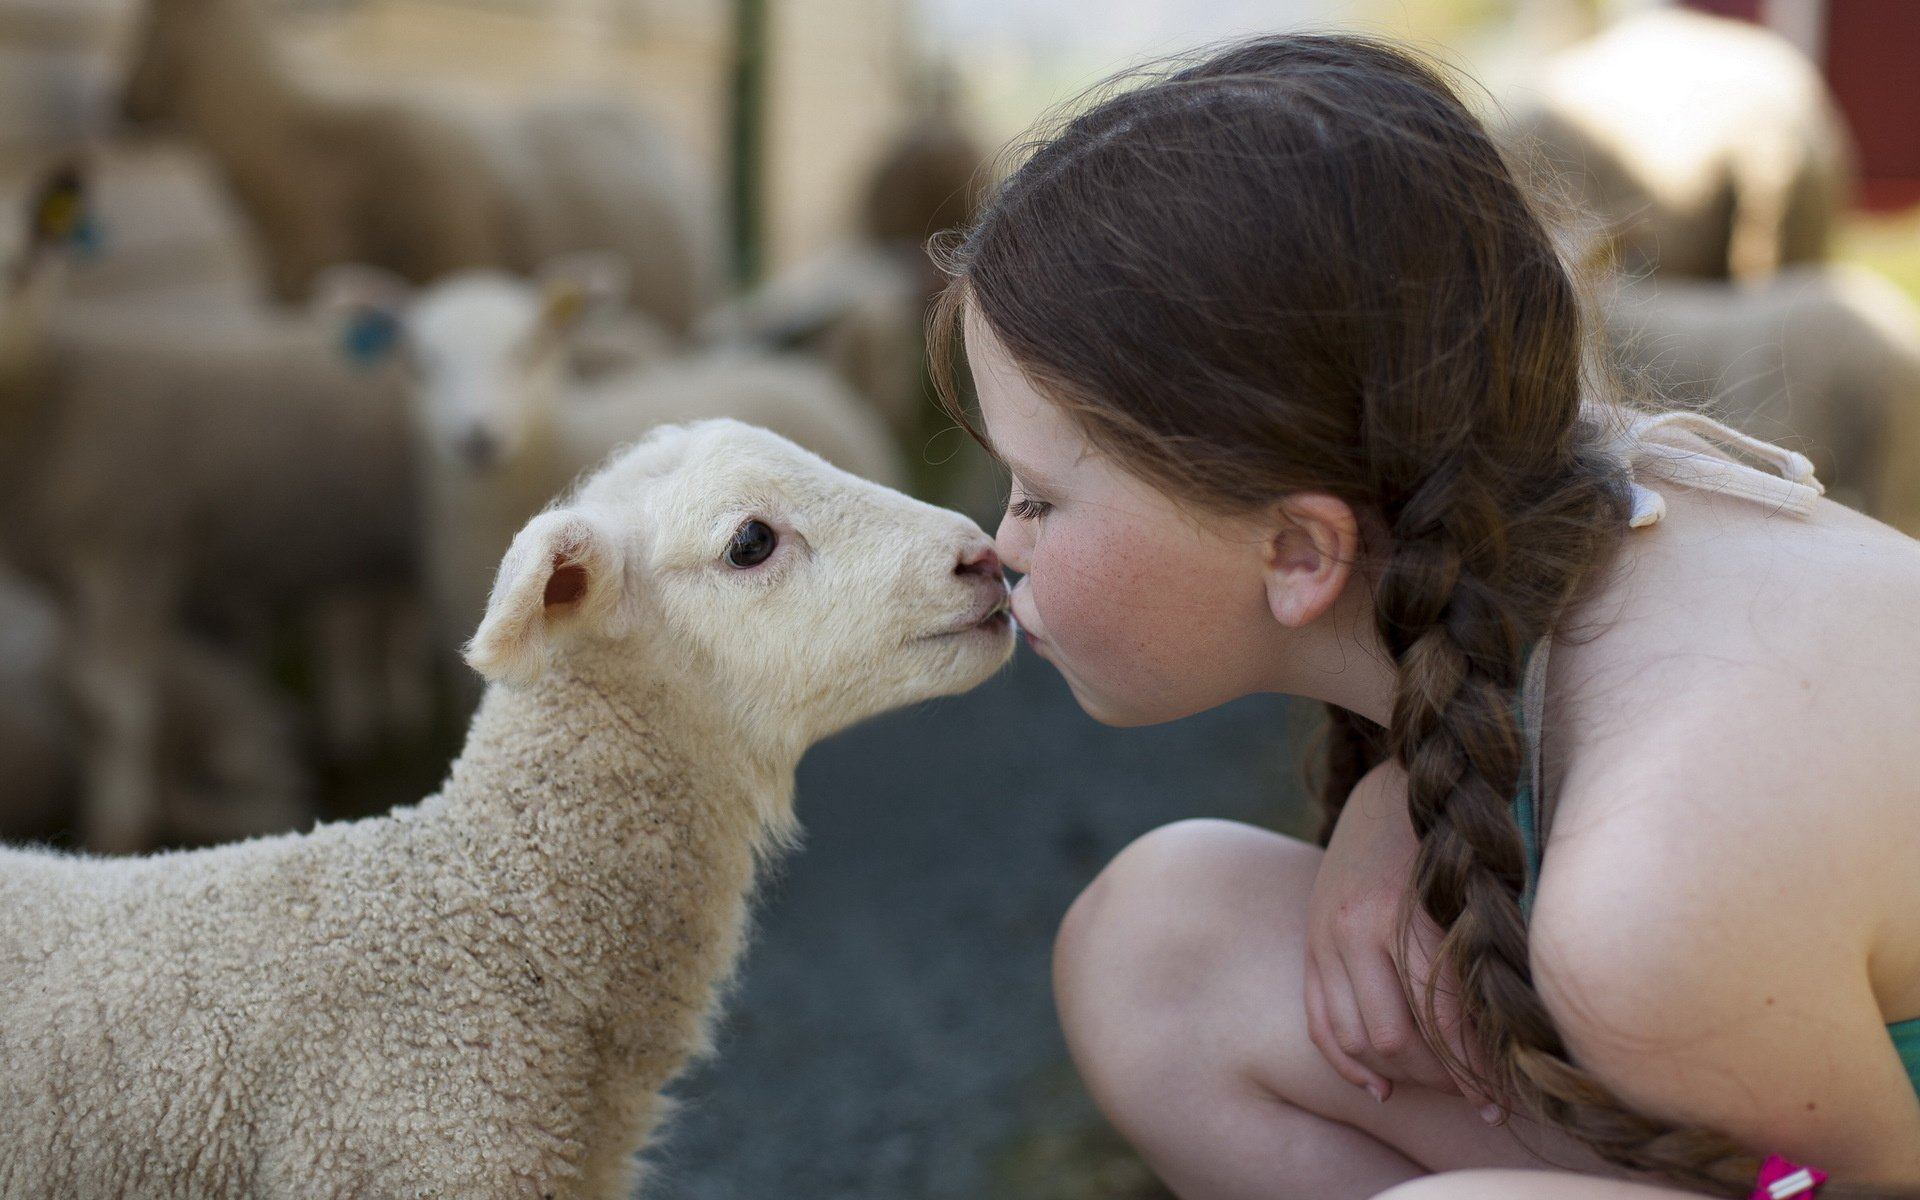 Small Cute Baby Kissing Wallpaper Child Sheep Lamb Kissing Affection Feeling Animal Love